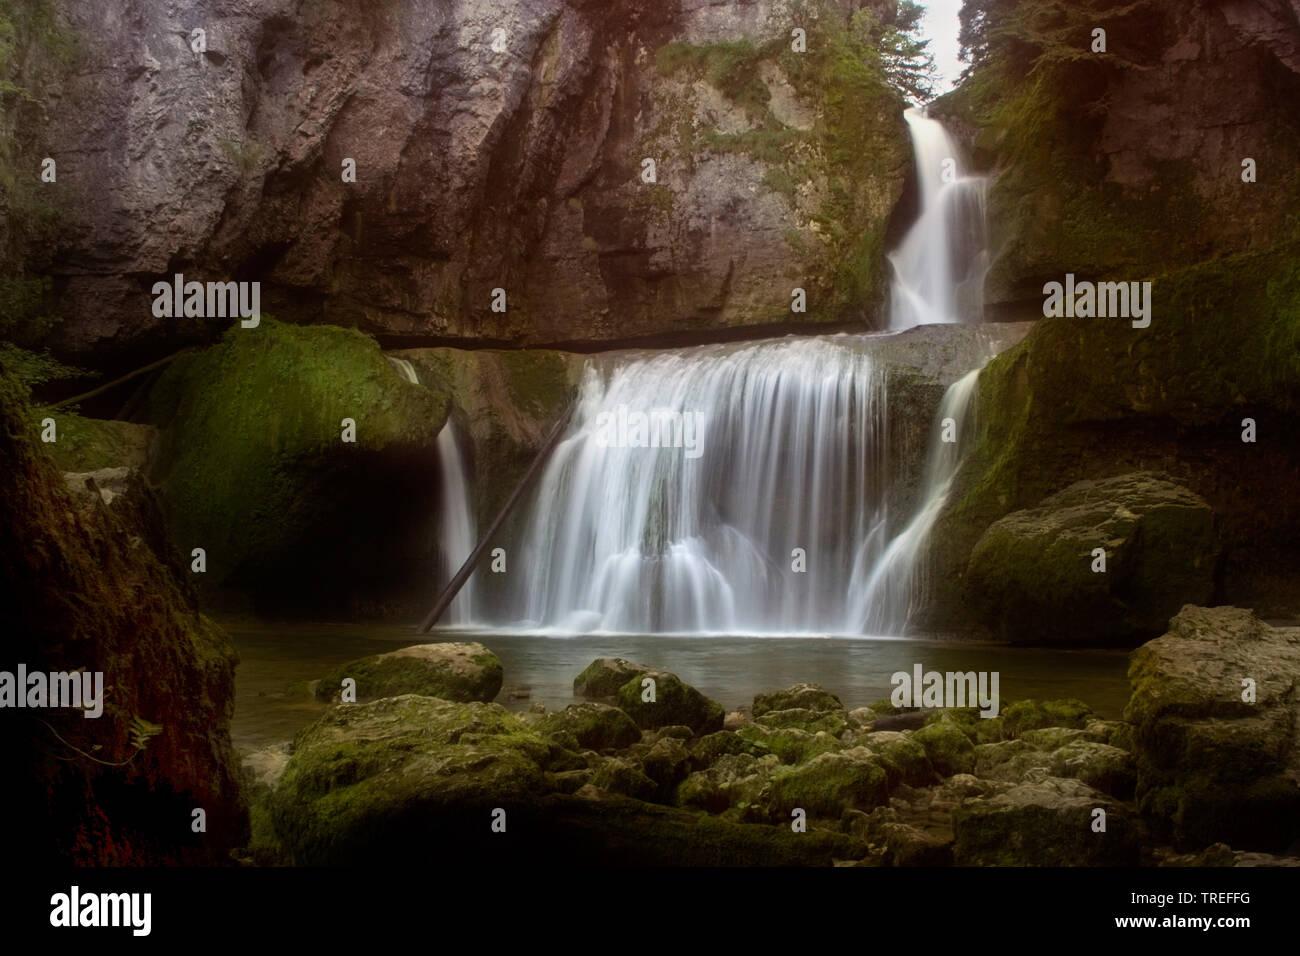 Cascade cascade de la Billaude, France, Bourgogne-Franche-ComtÚ, Jura, Vaudioux Banque D'Images